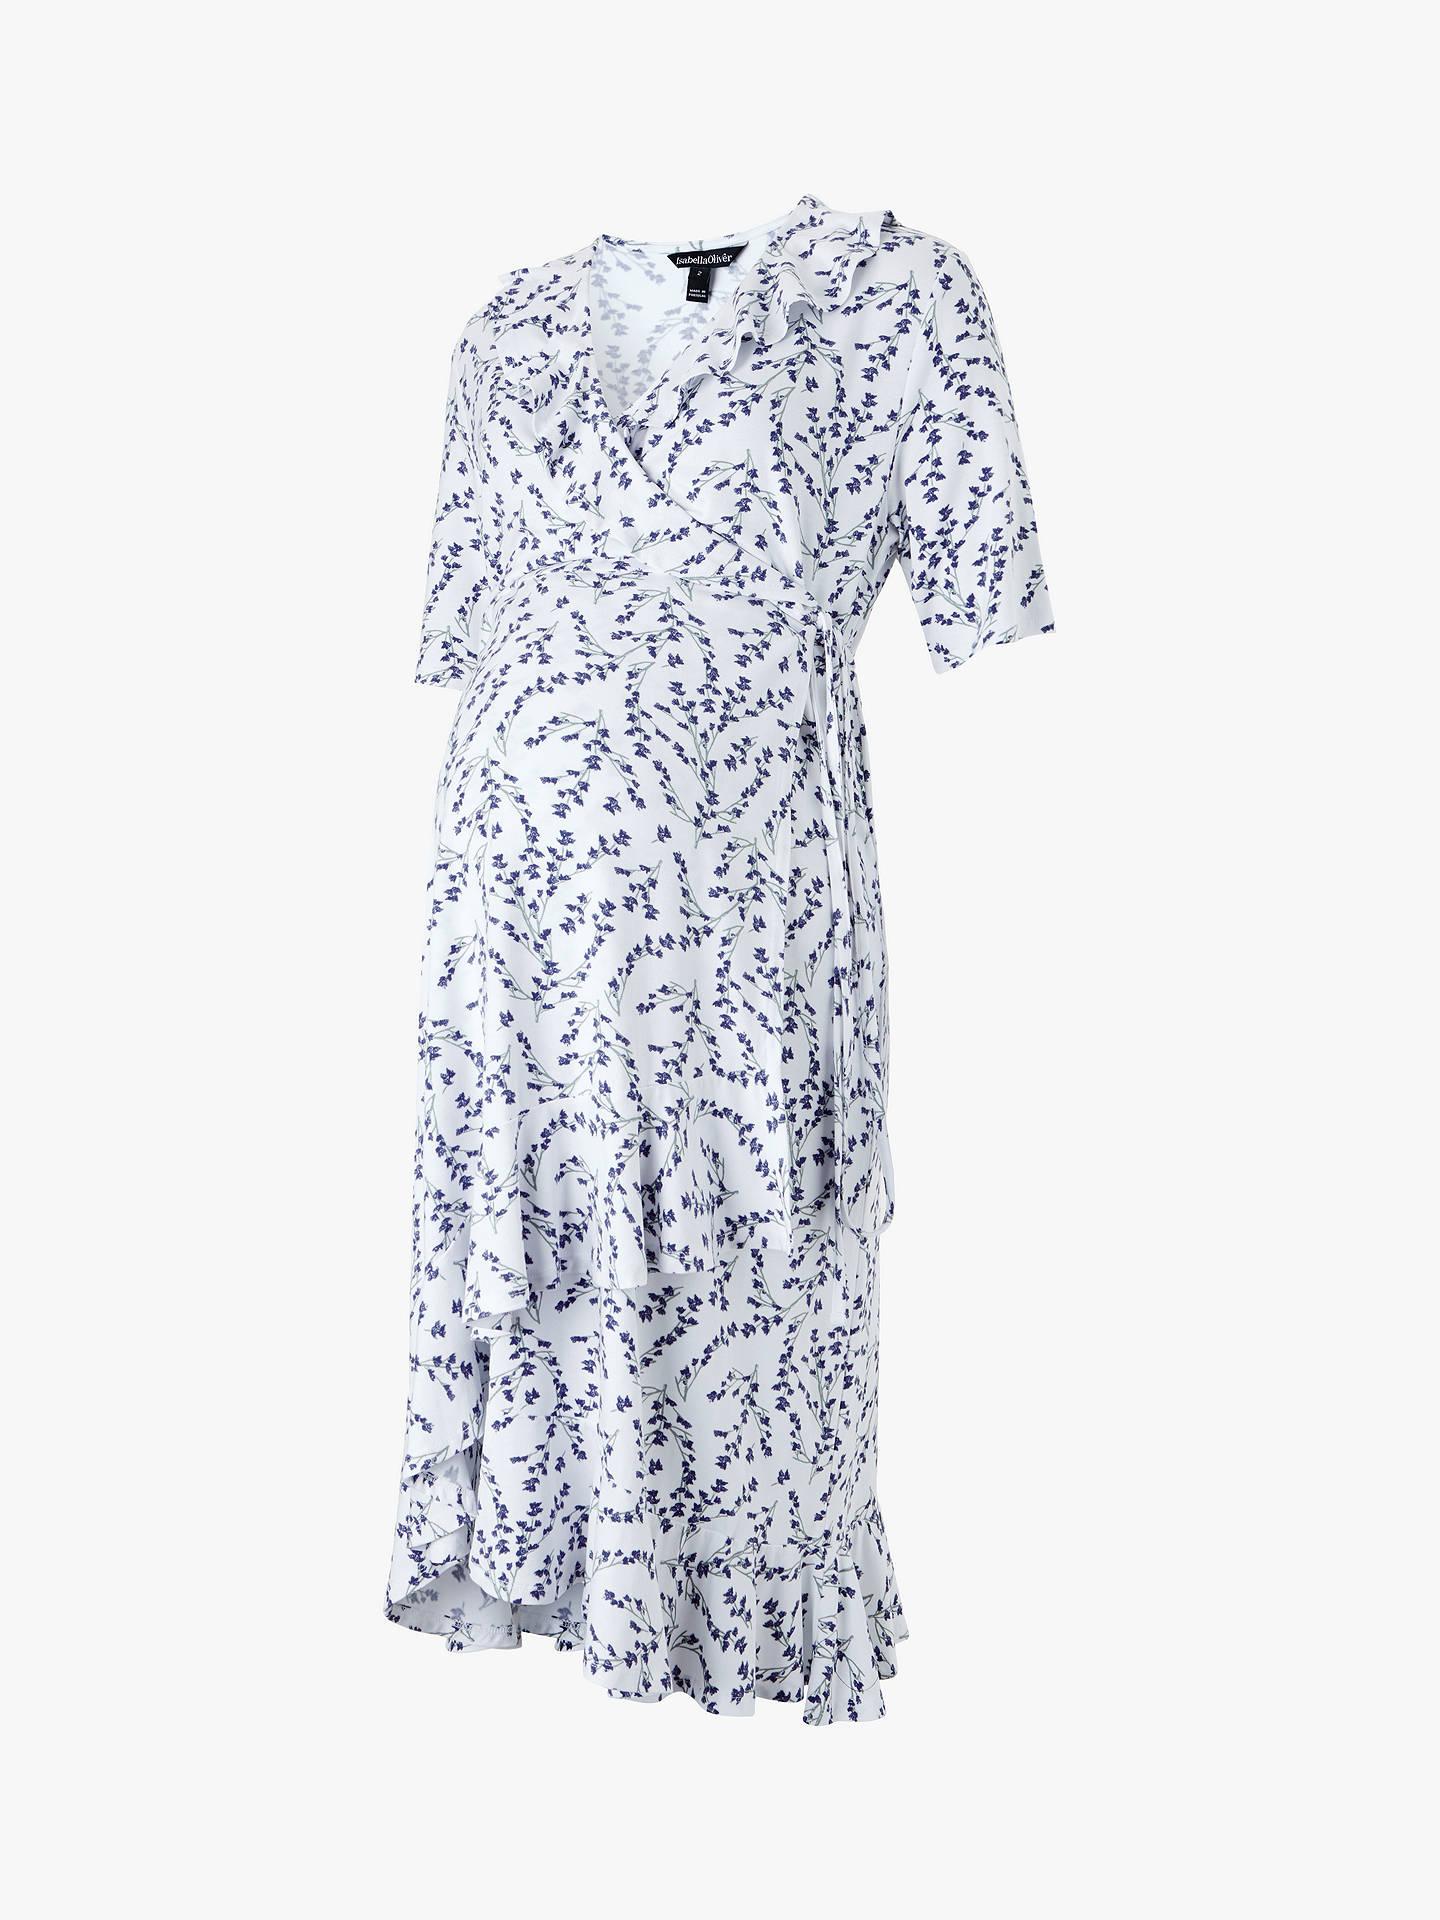 9ff51c30ab9 ... Buy Isabella Oliver Lullah Floral Wrap Over Maternity Dress